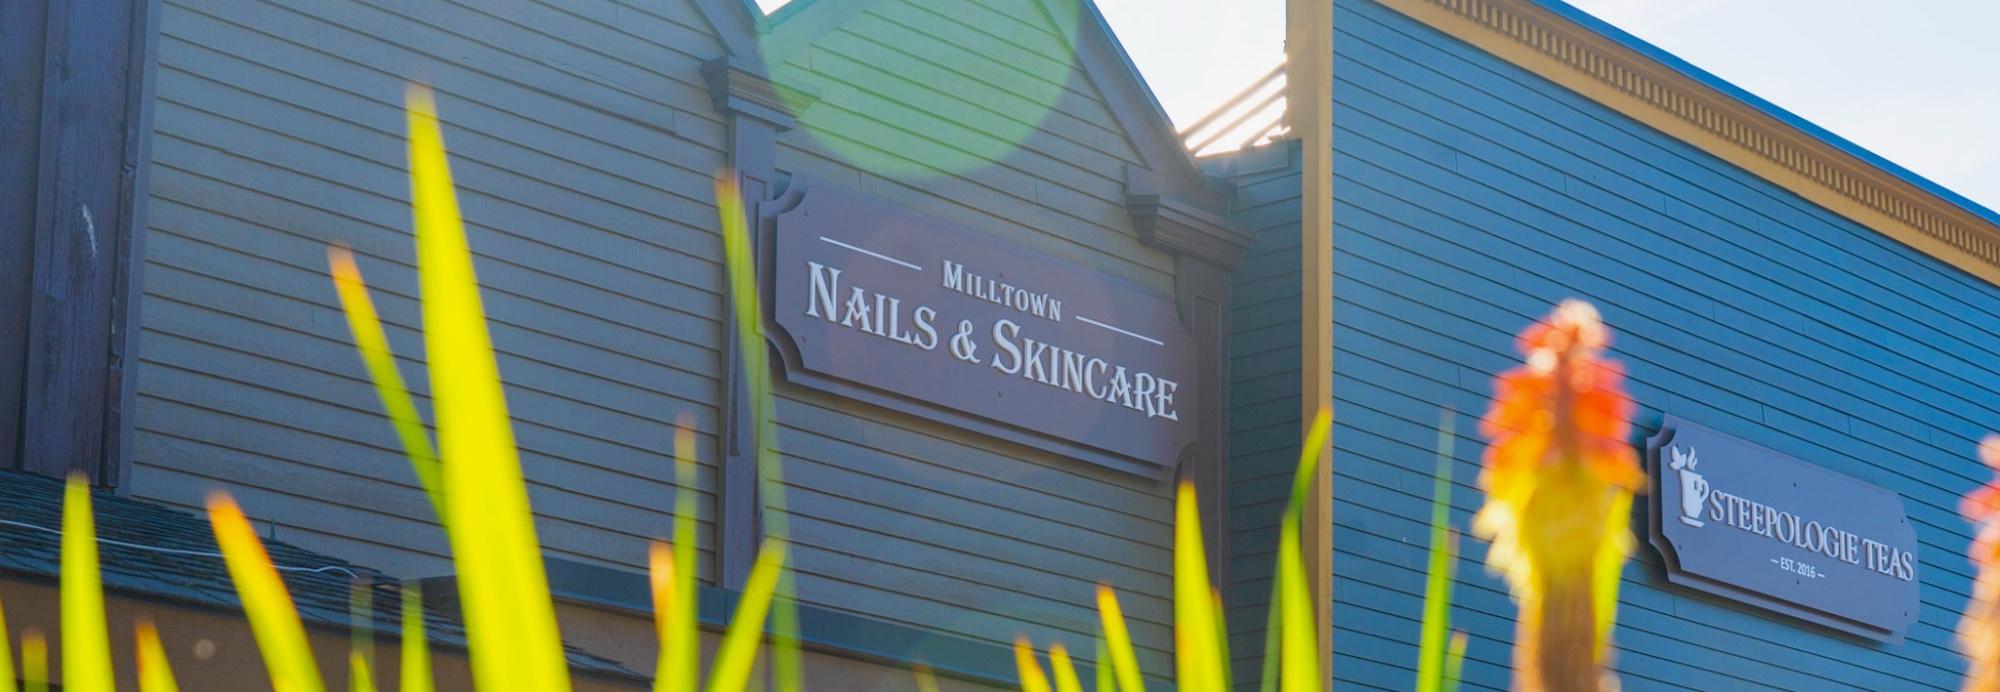 Milltown Nails in Downtown Edmonds